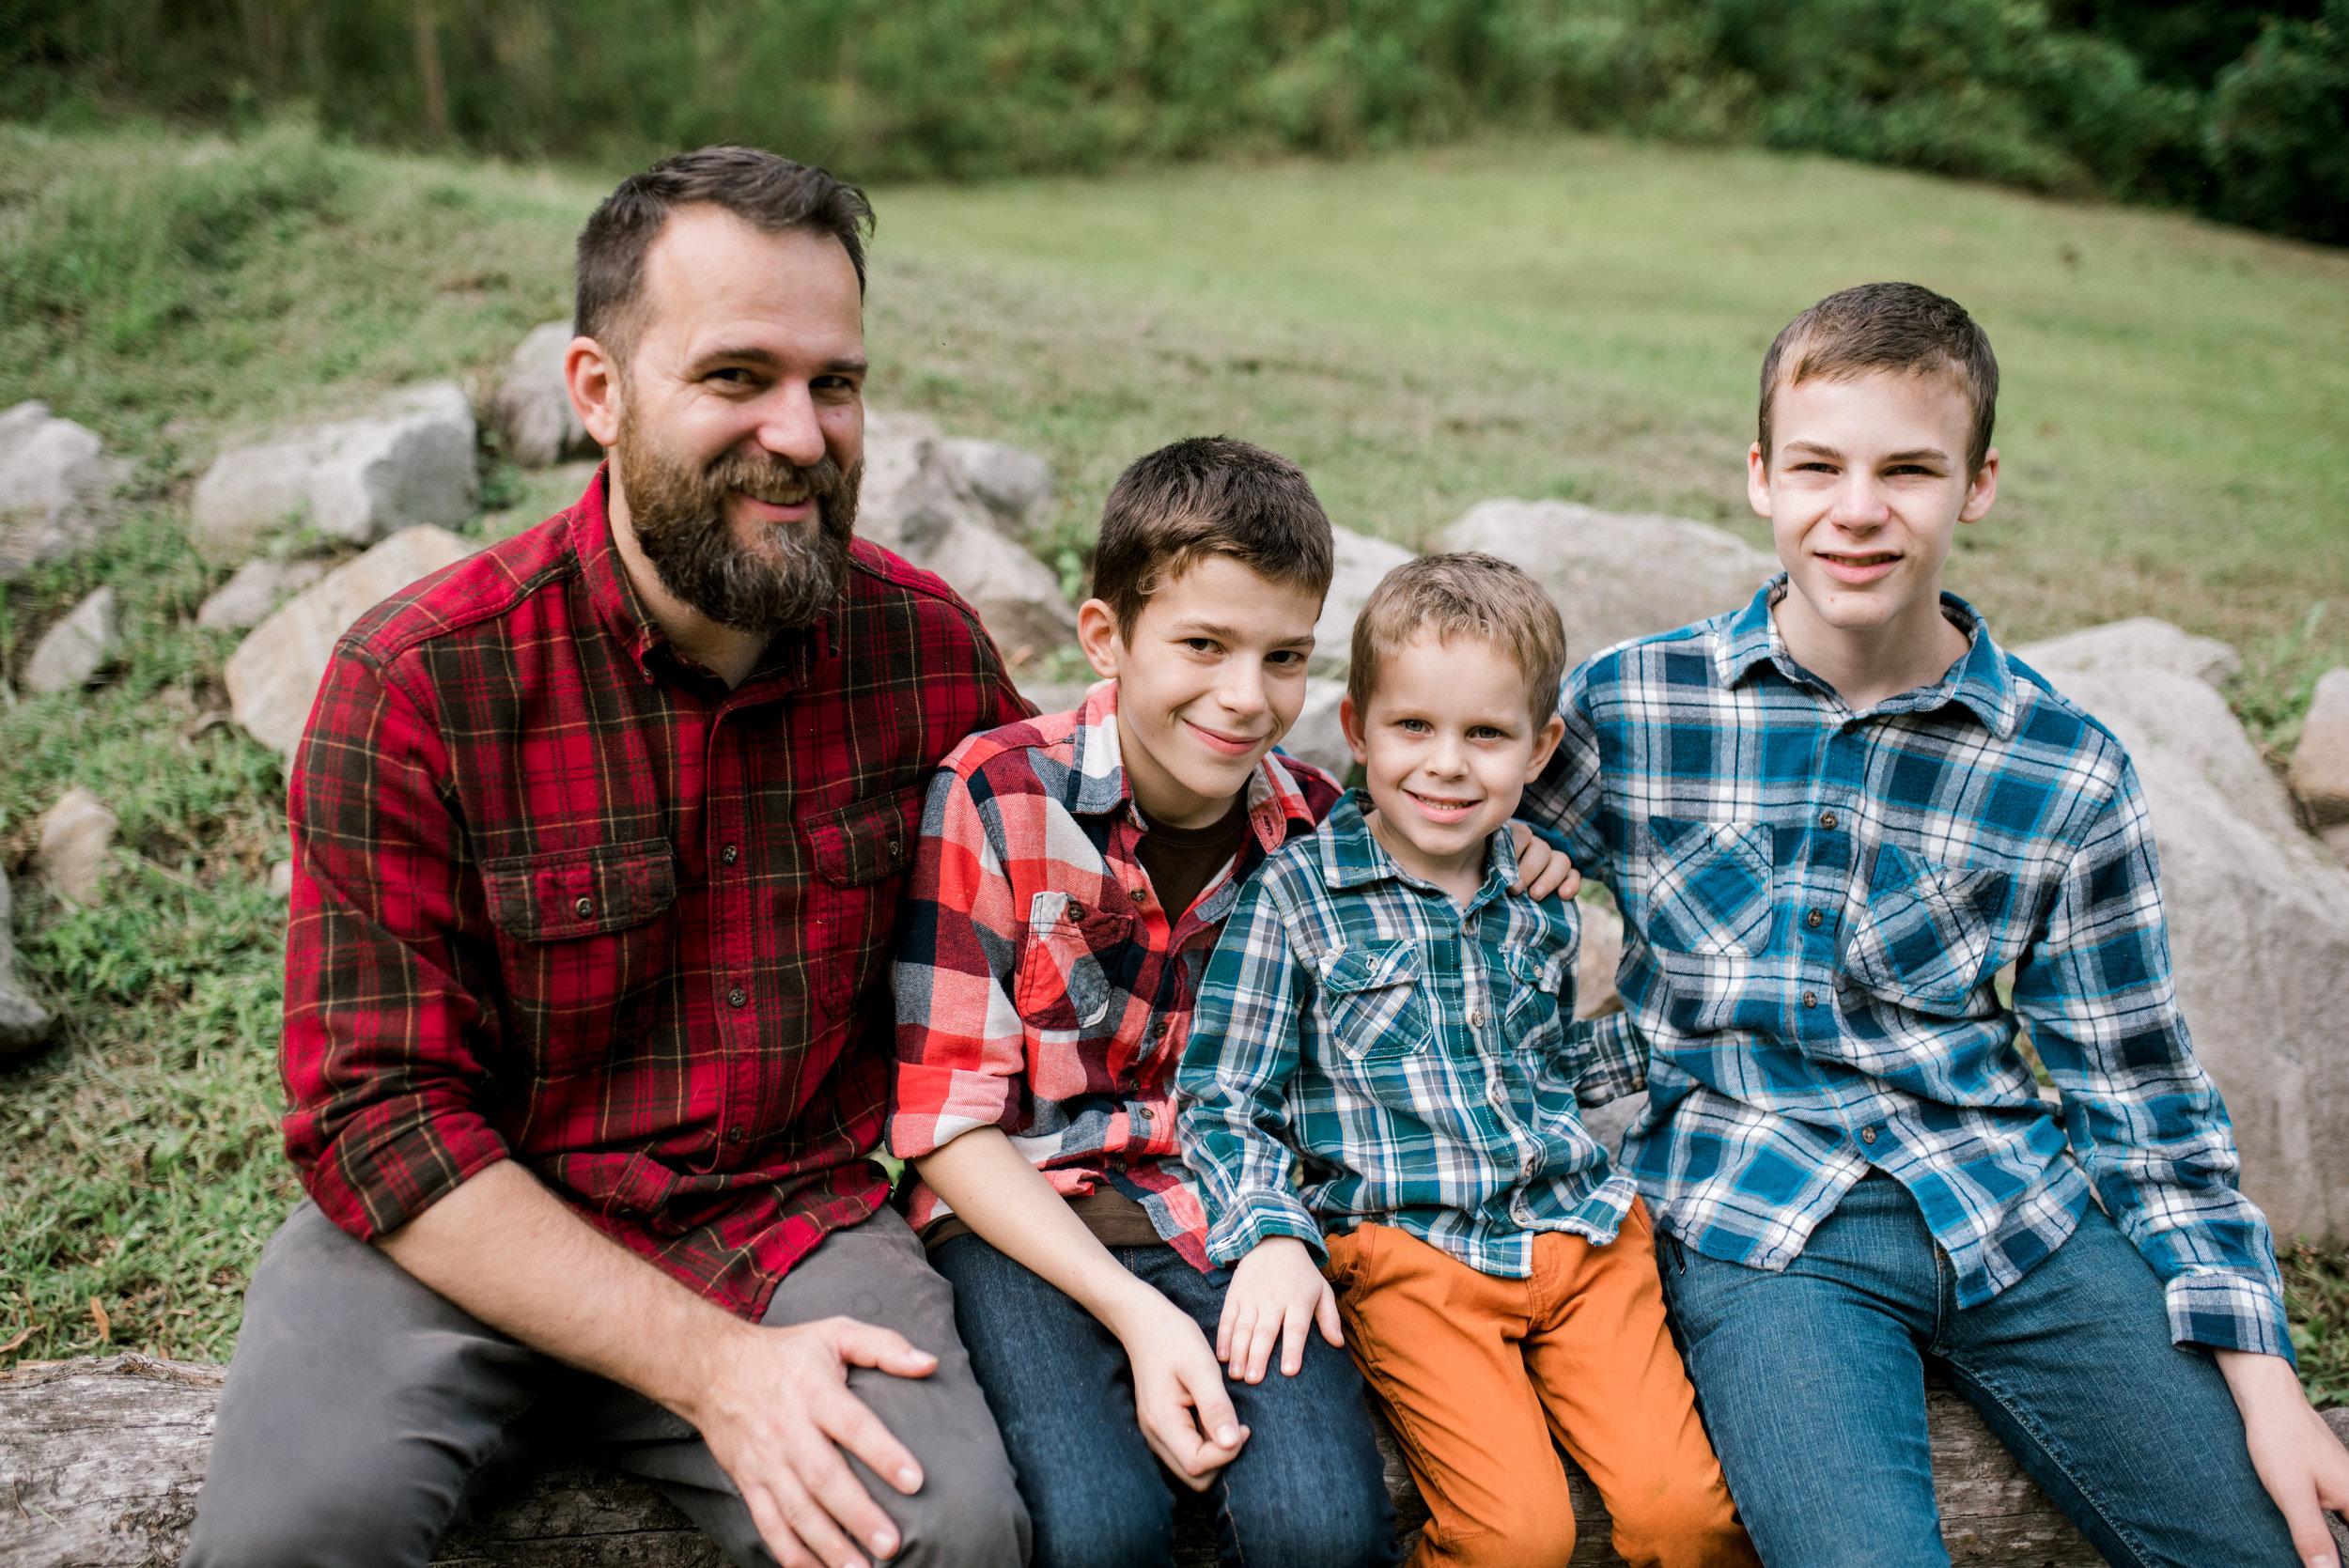 prestonsburg-family-photographer-kentucky